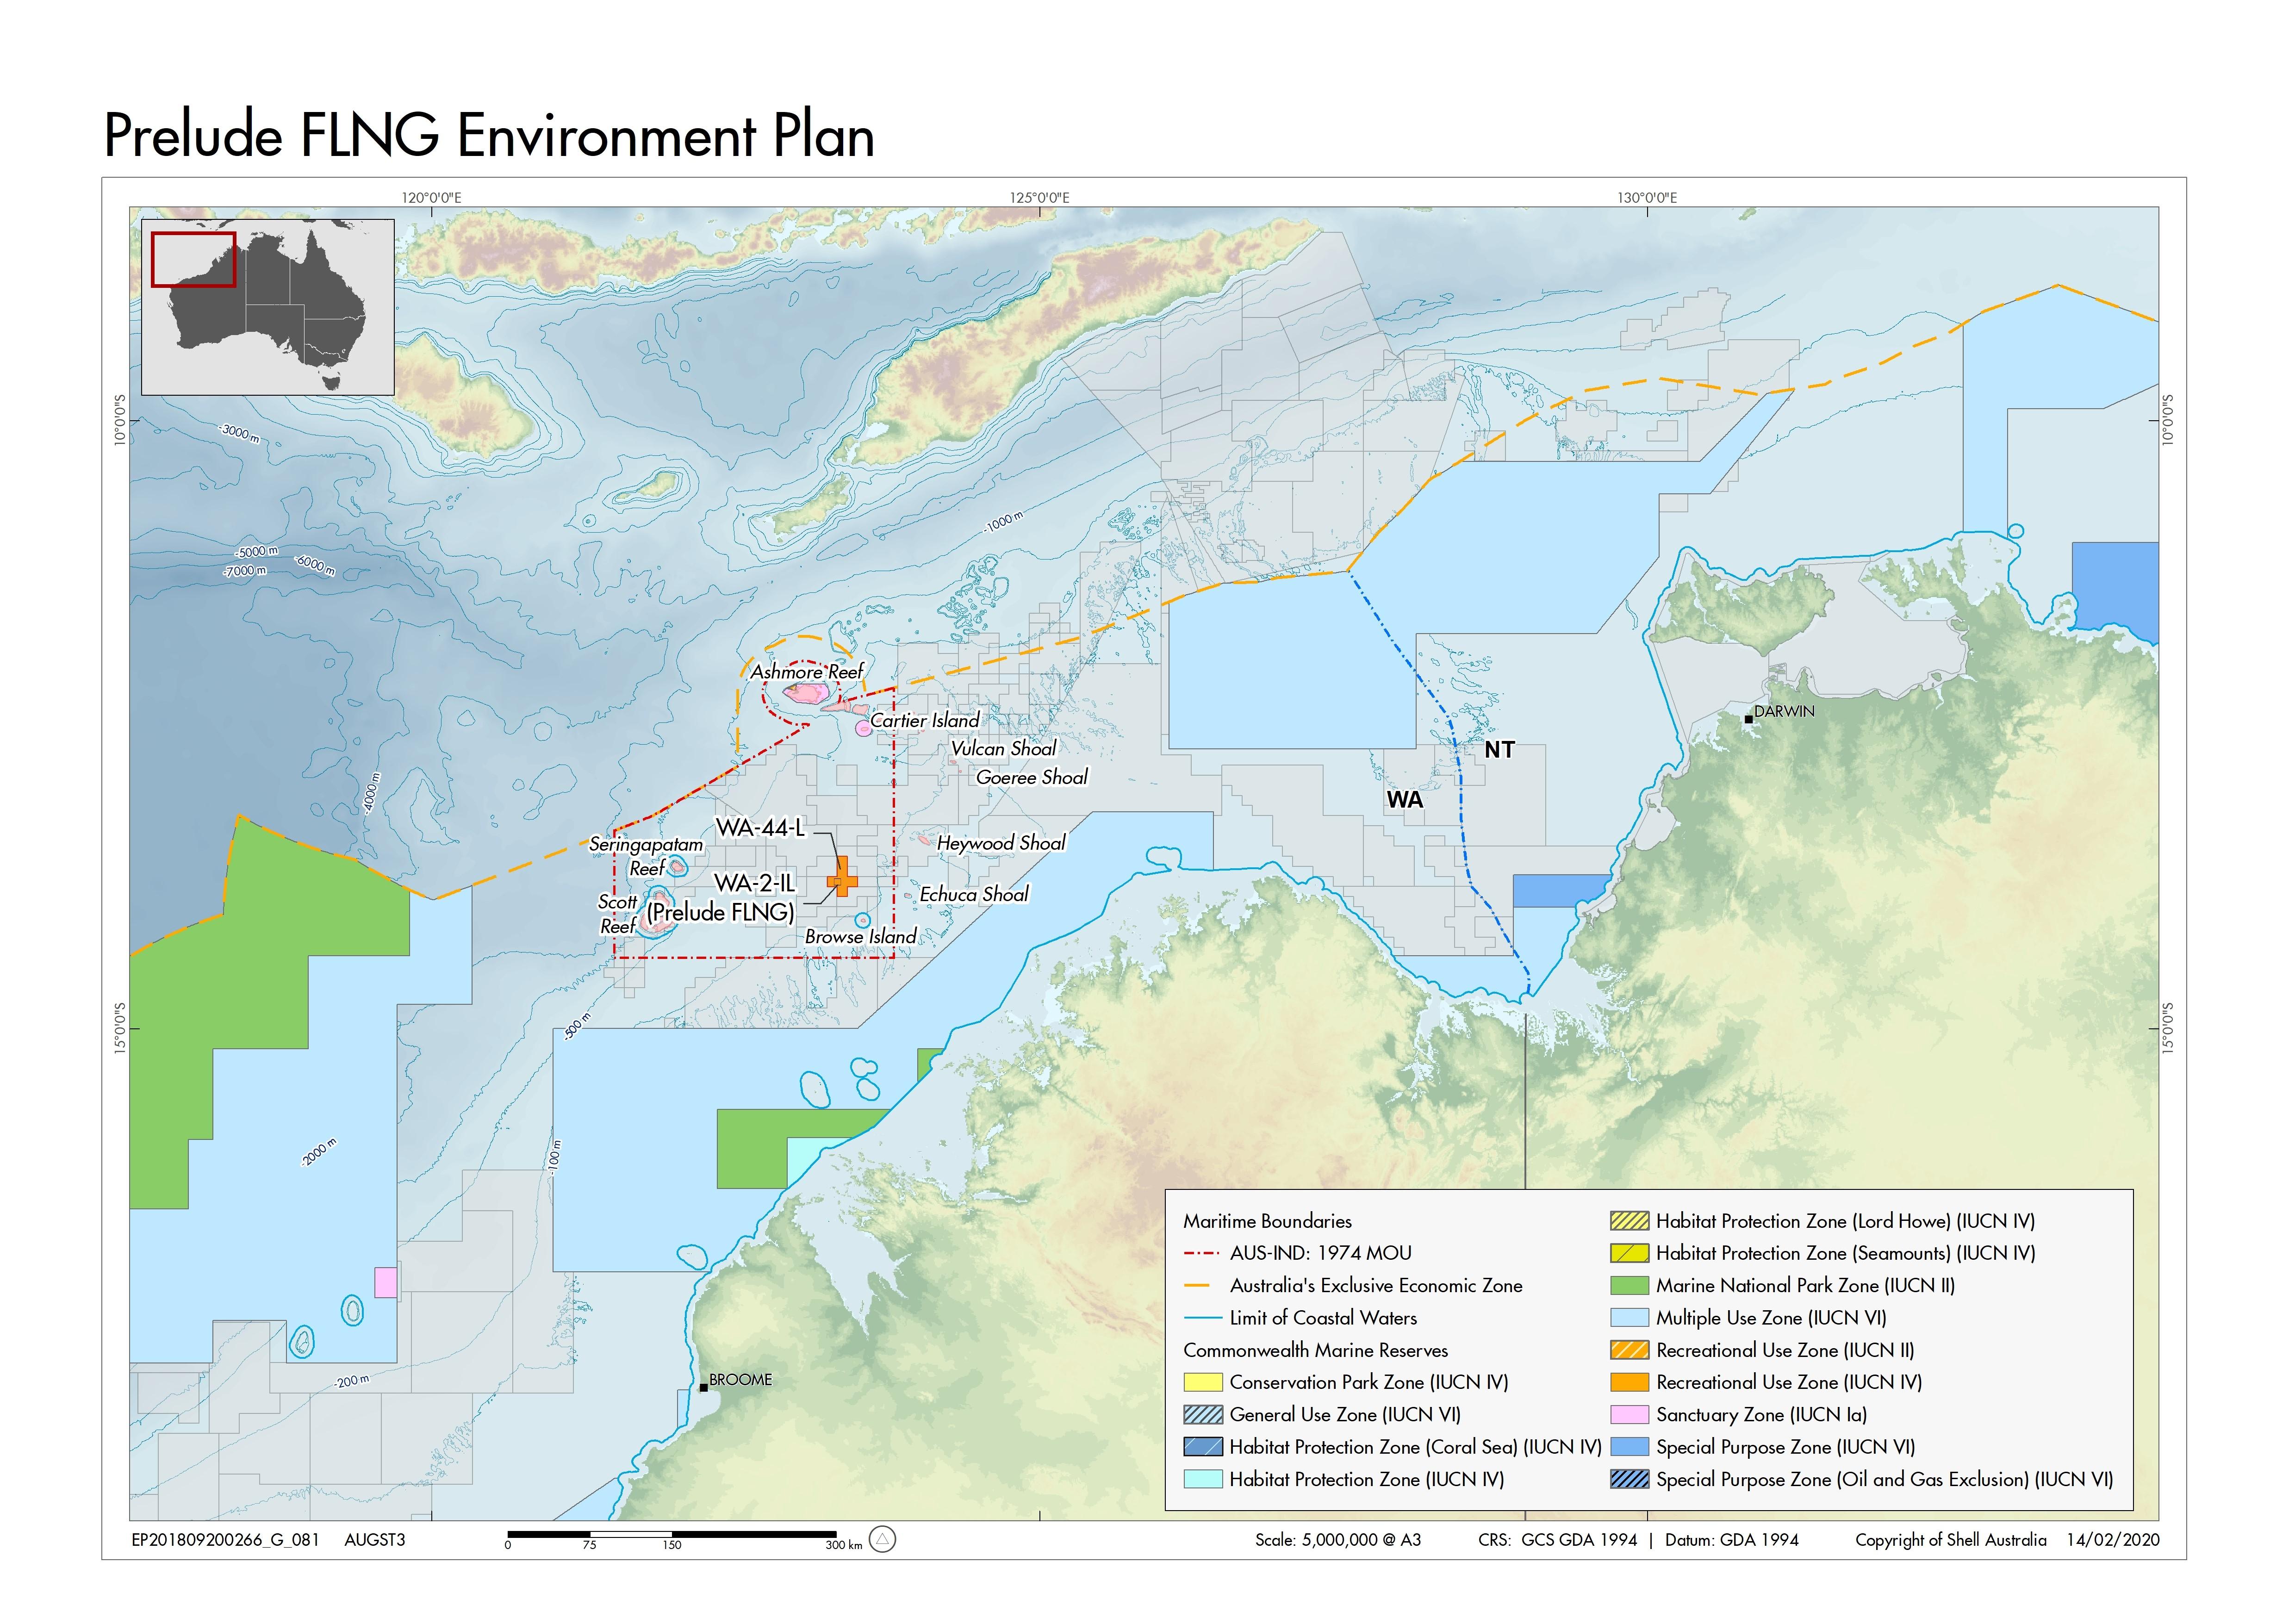 Location map - Activity: Prelude FLNG (refer to description)